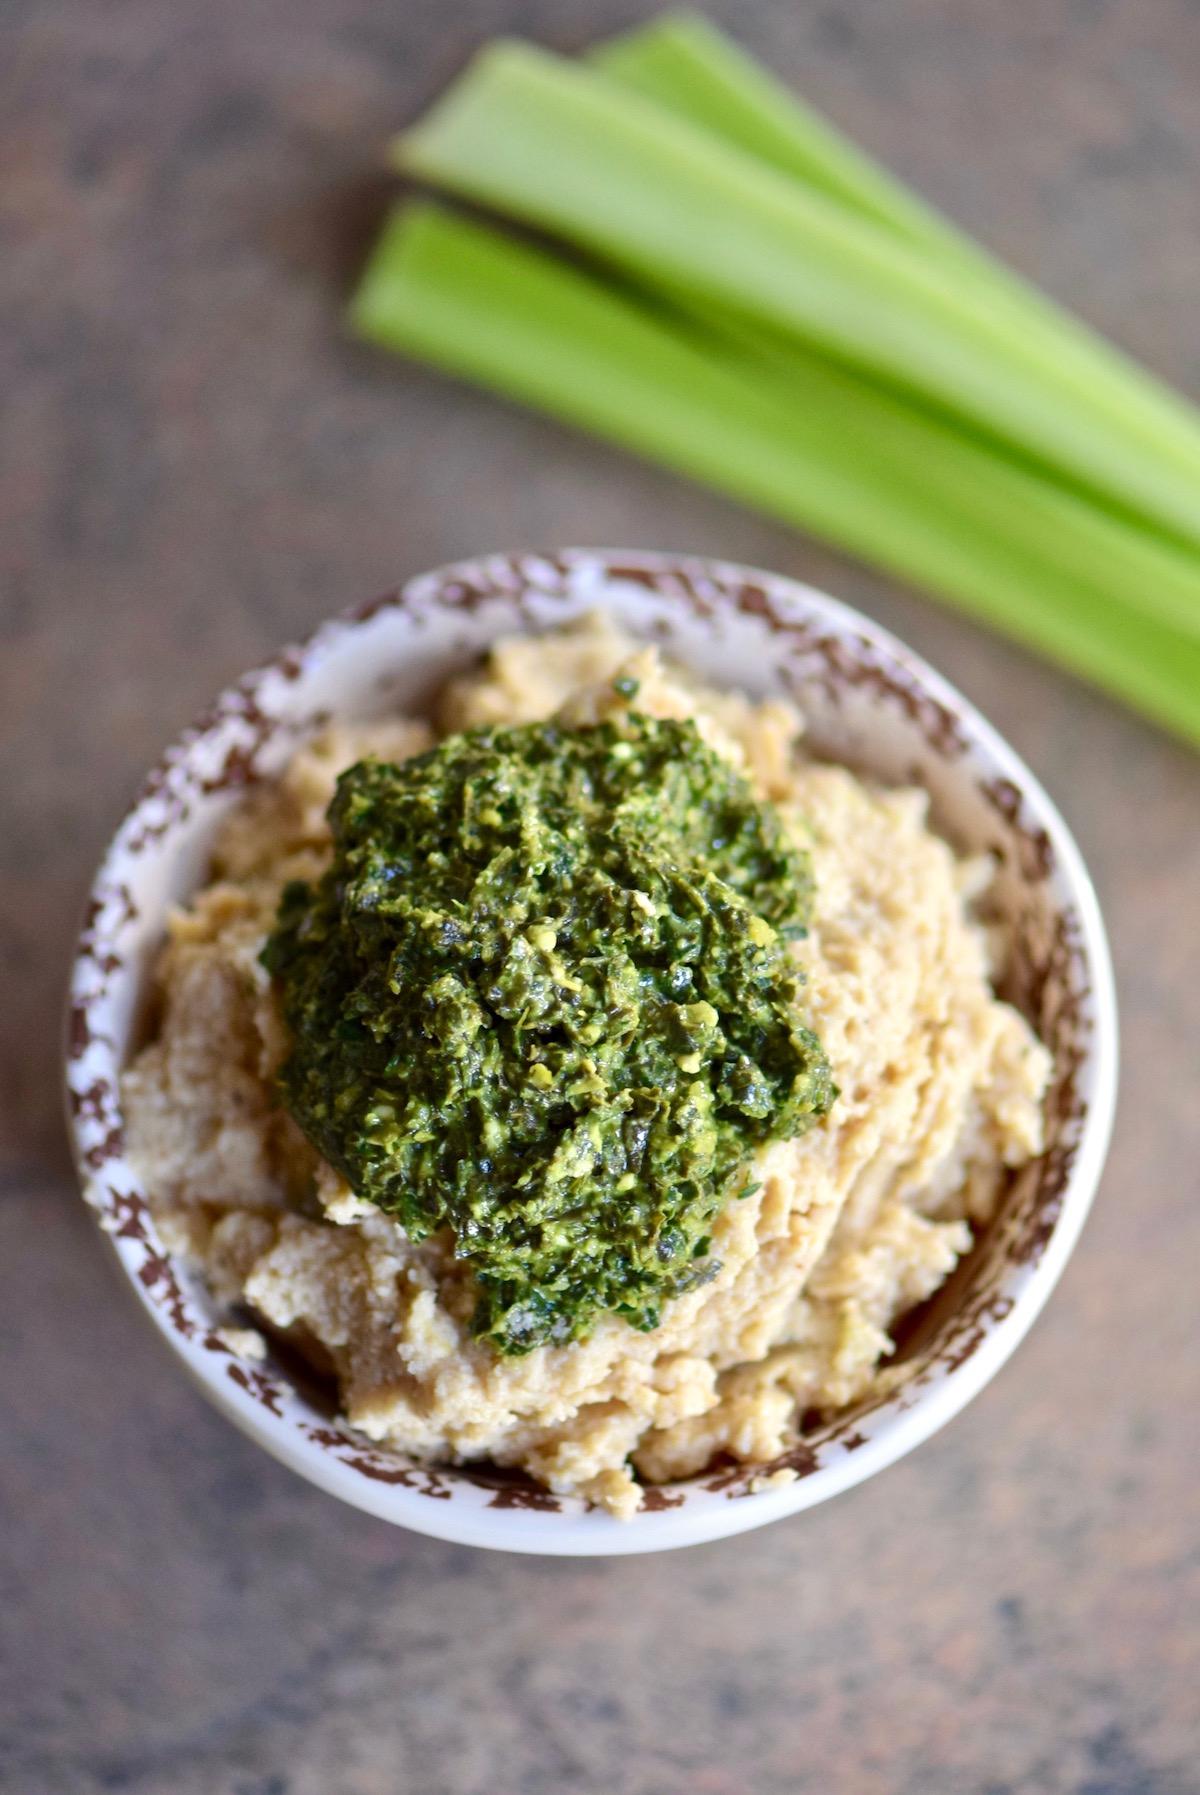 Cauliflower Hummus with Kale Pesto - double down on your veggies with this beanless hummus that's paleo and vegan   TastingPage.com